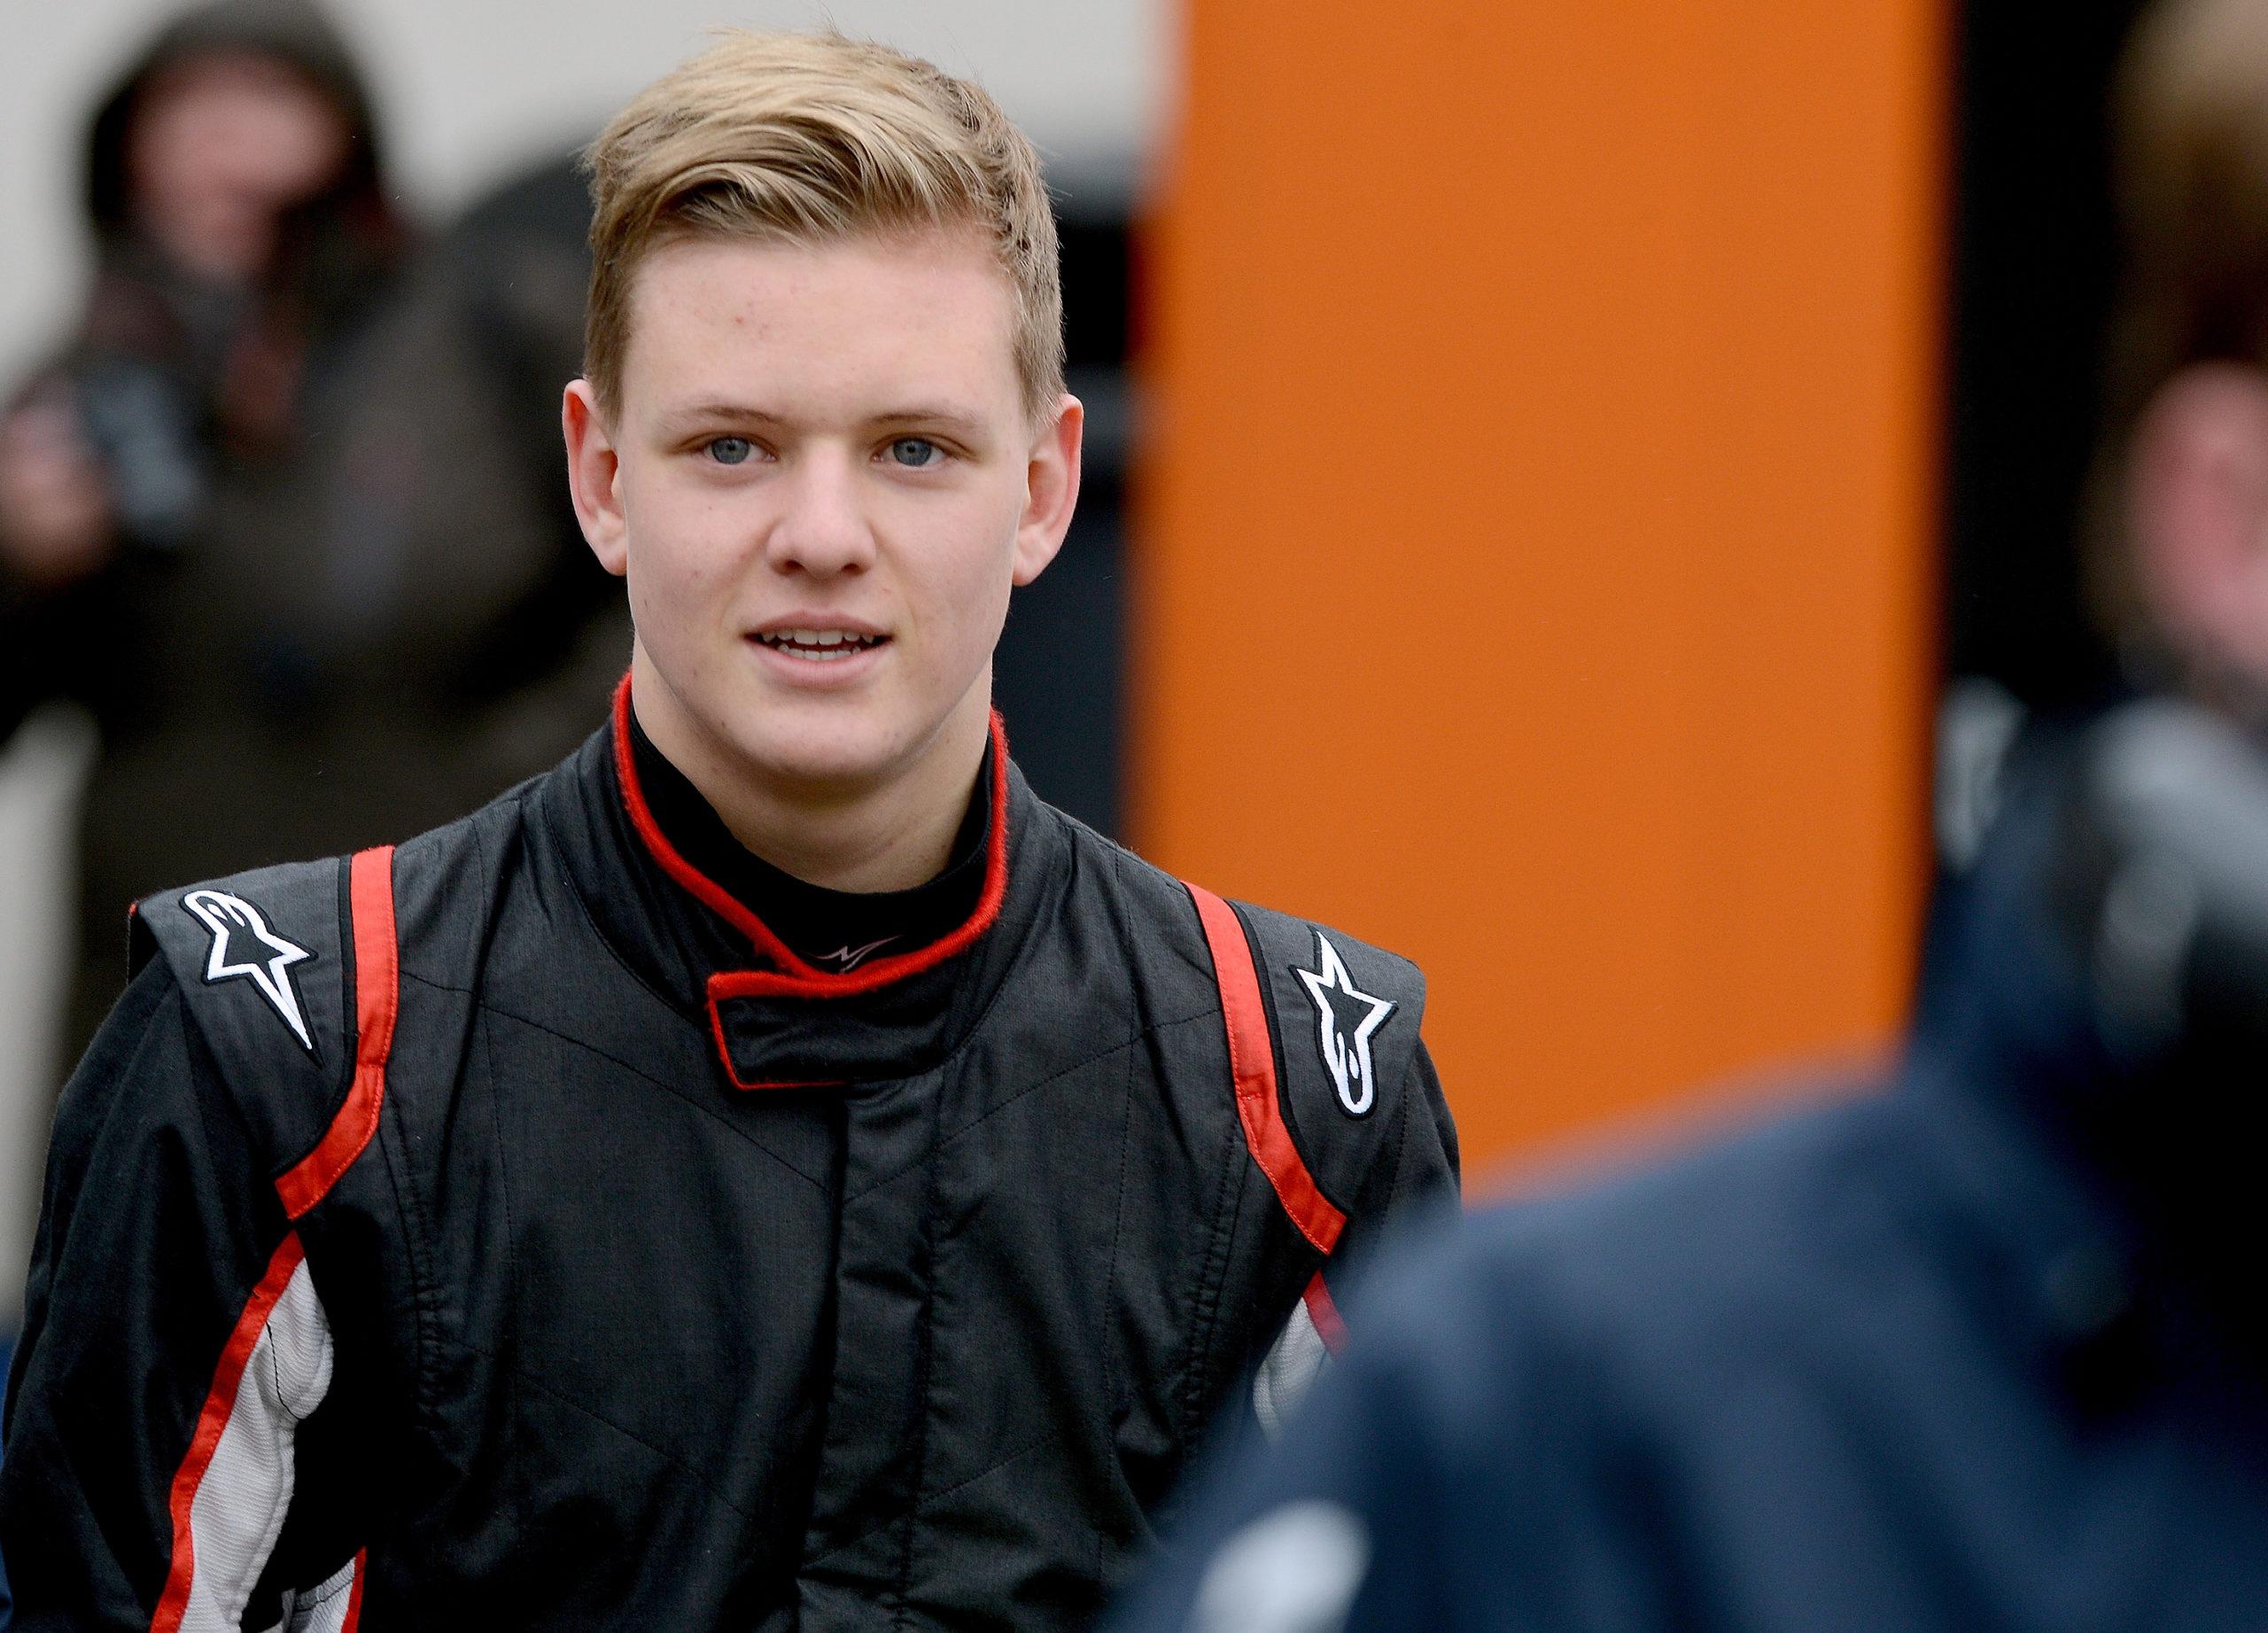 Сын Михаэля Шумахера будет пилотом «Формулы-1»